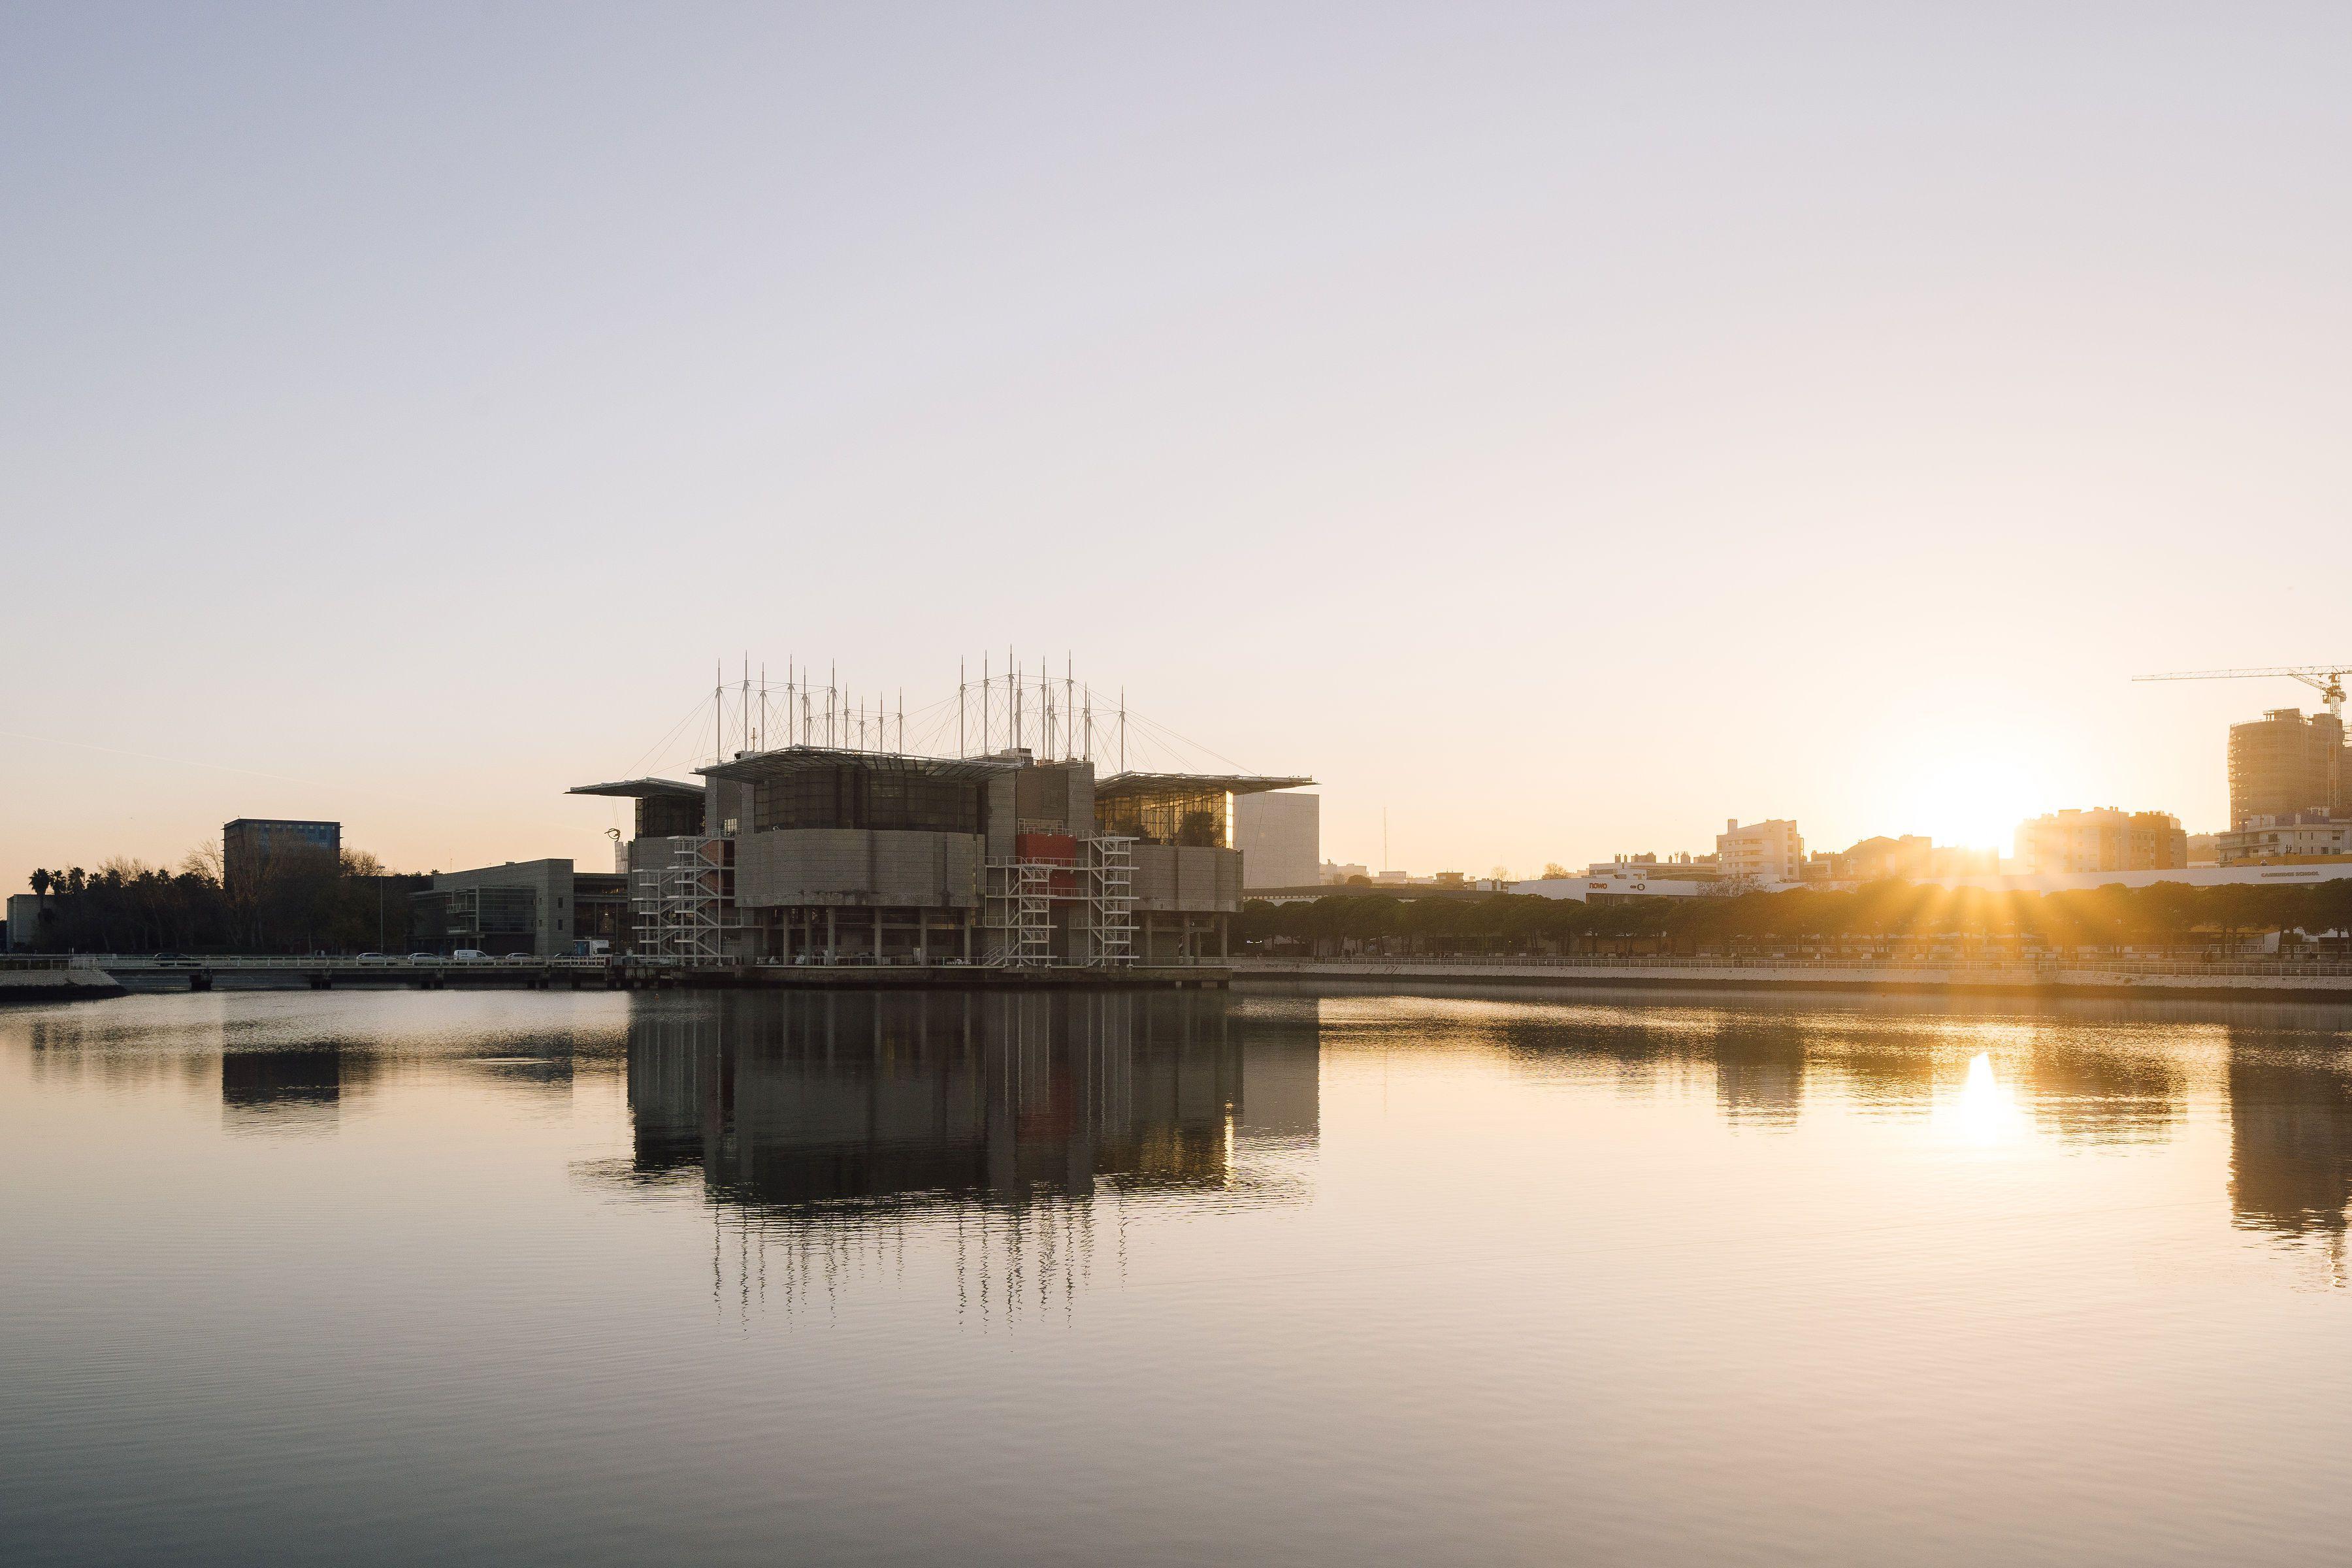 Lisbon Oceanarium: The Complete Guide